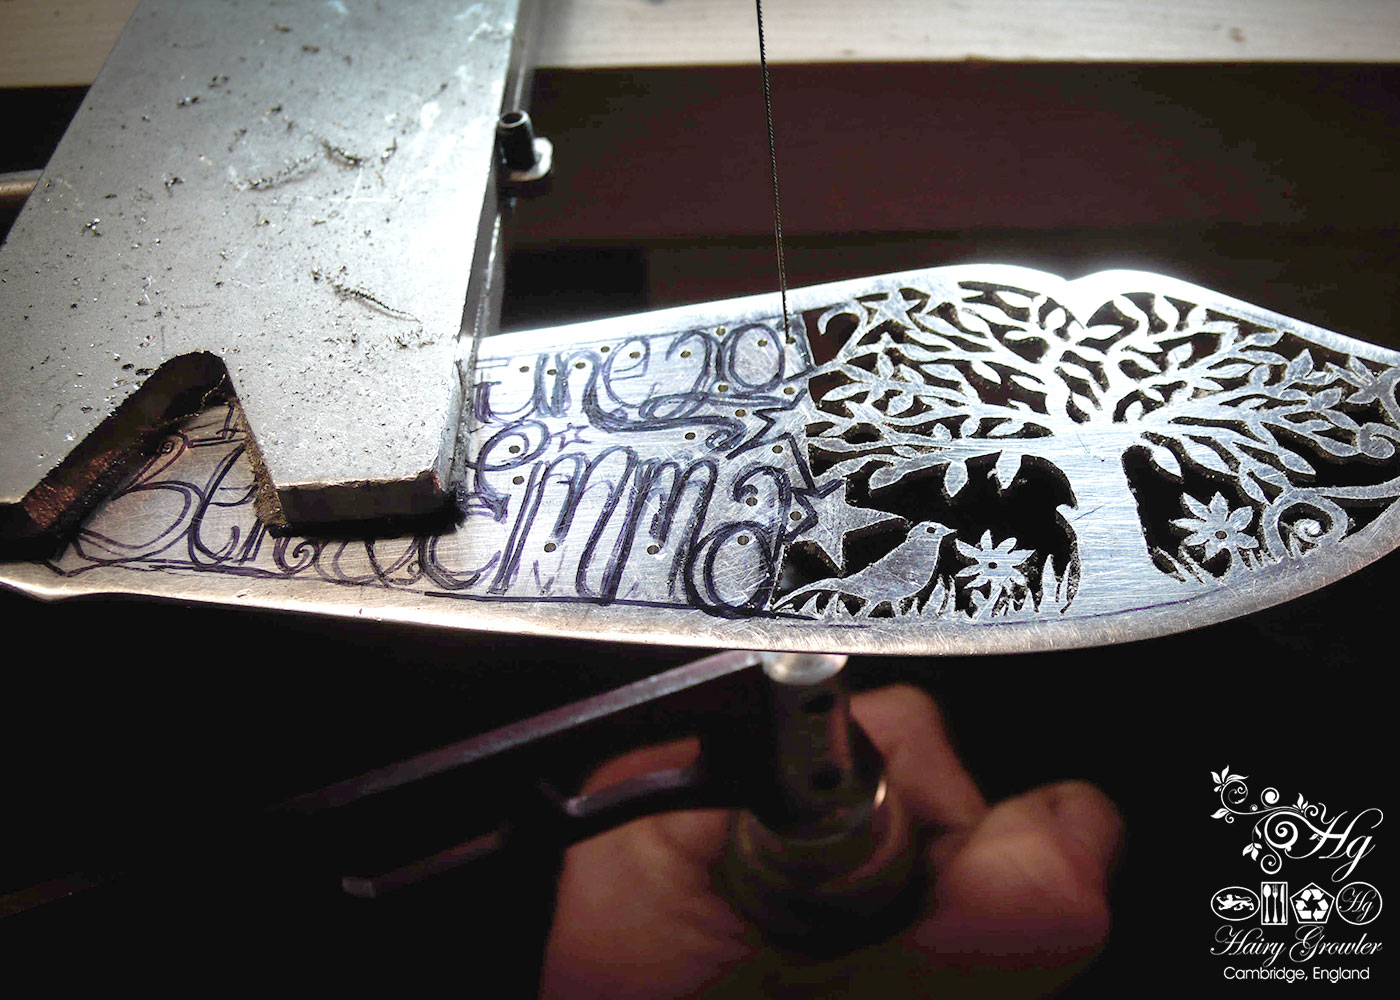 bespoke hand crafted and upcycled wedding-cake-knife